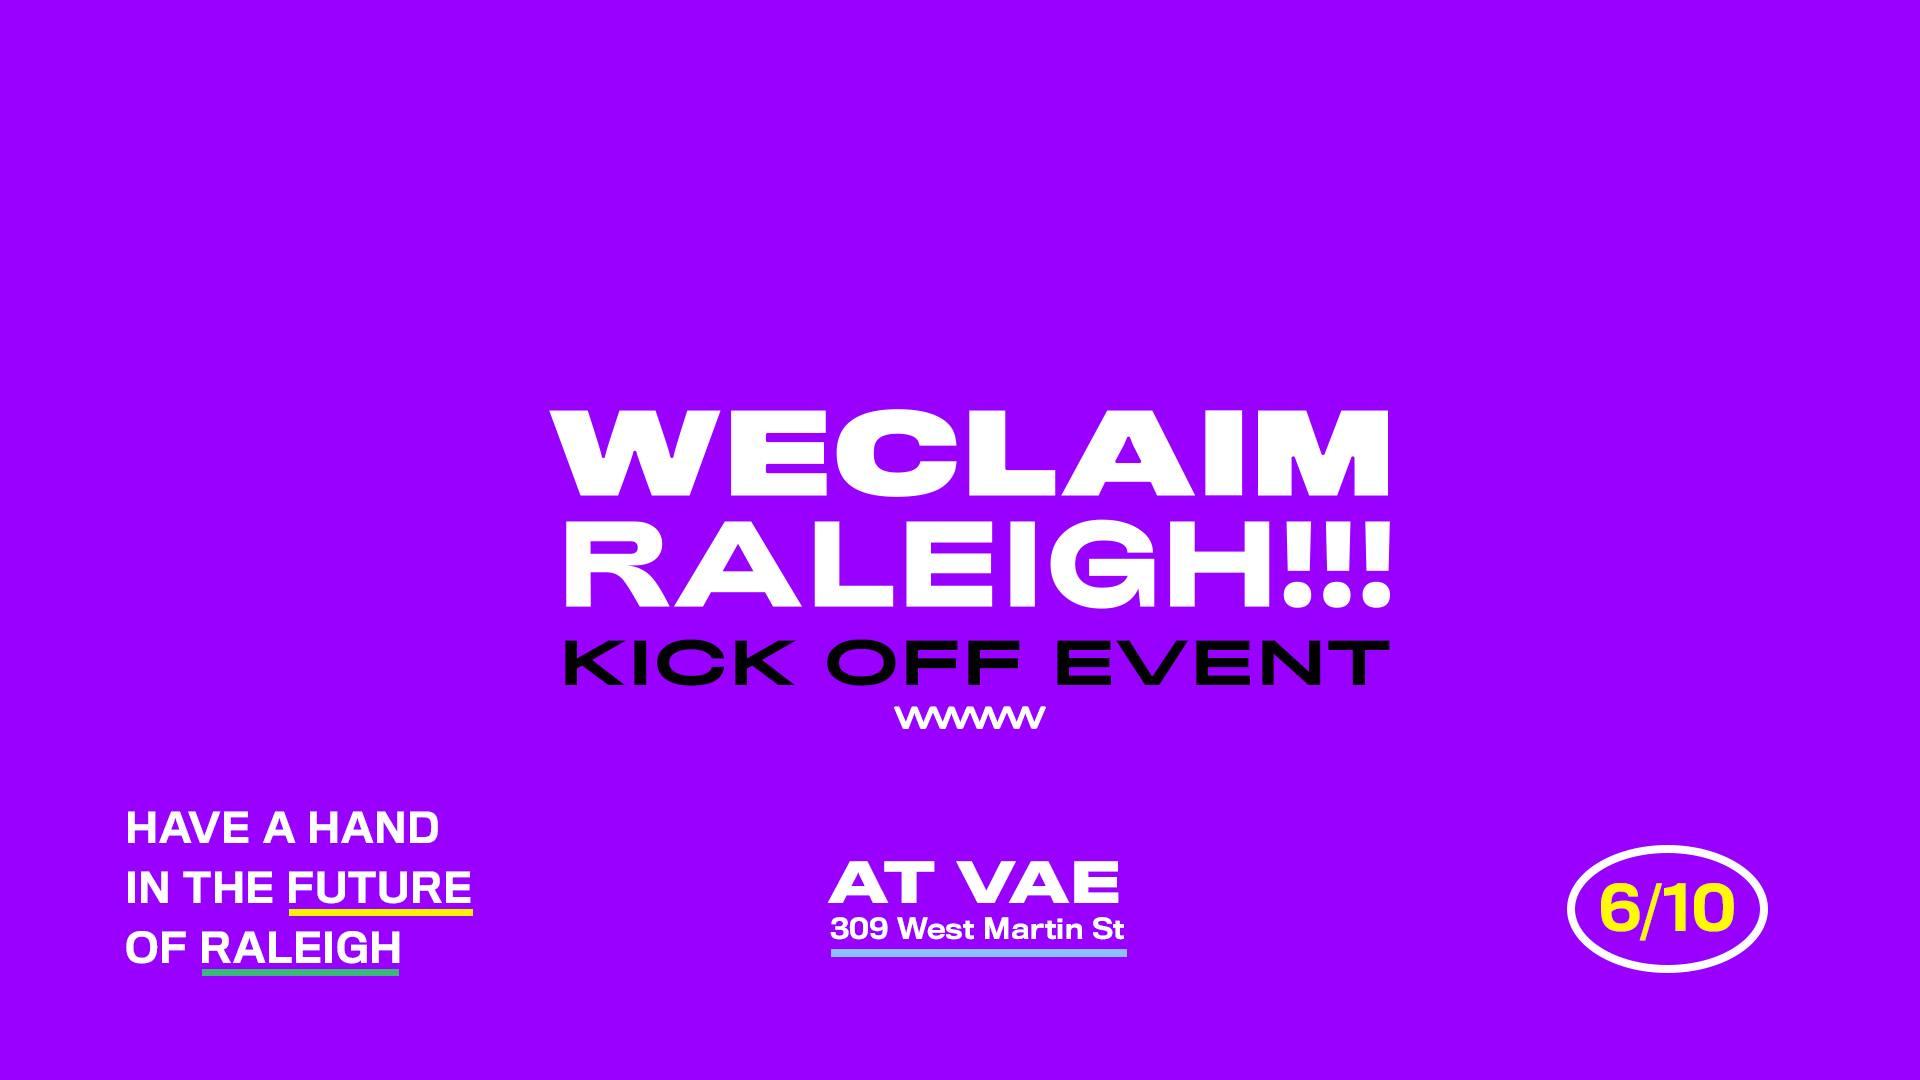 we-claim-raleigh.jpg